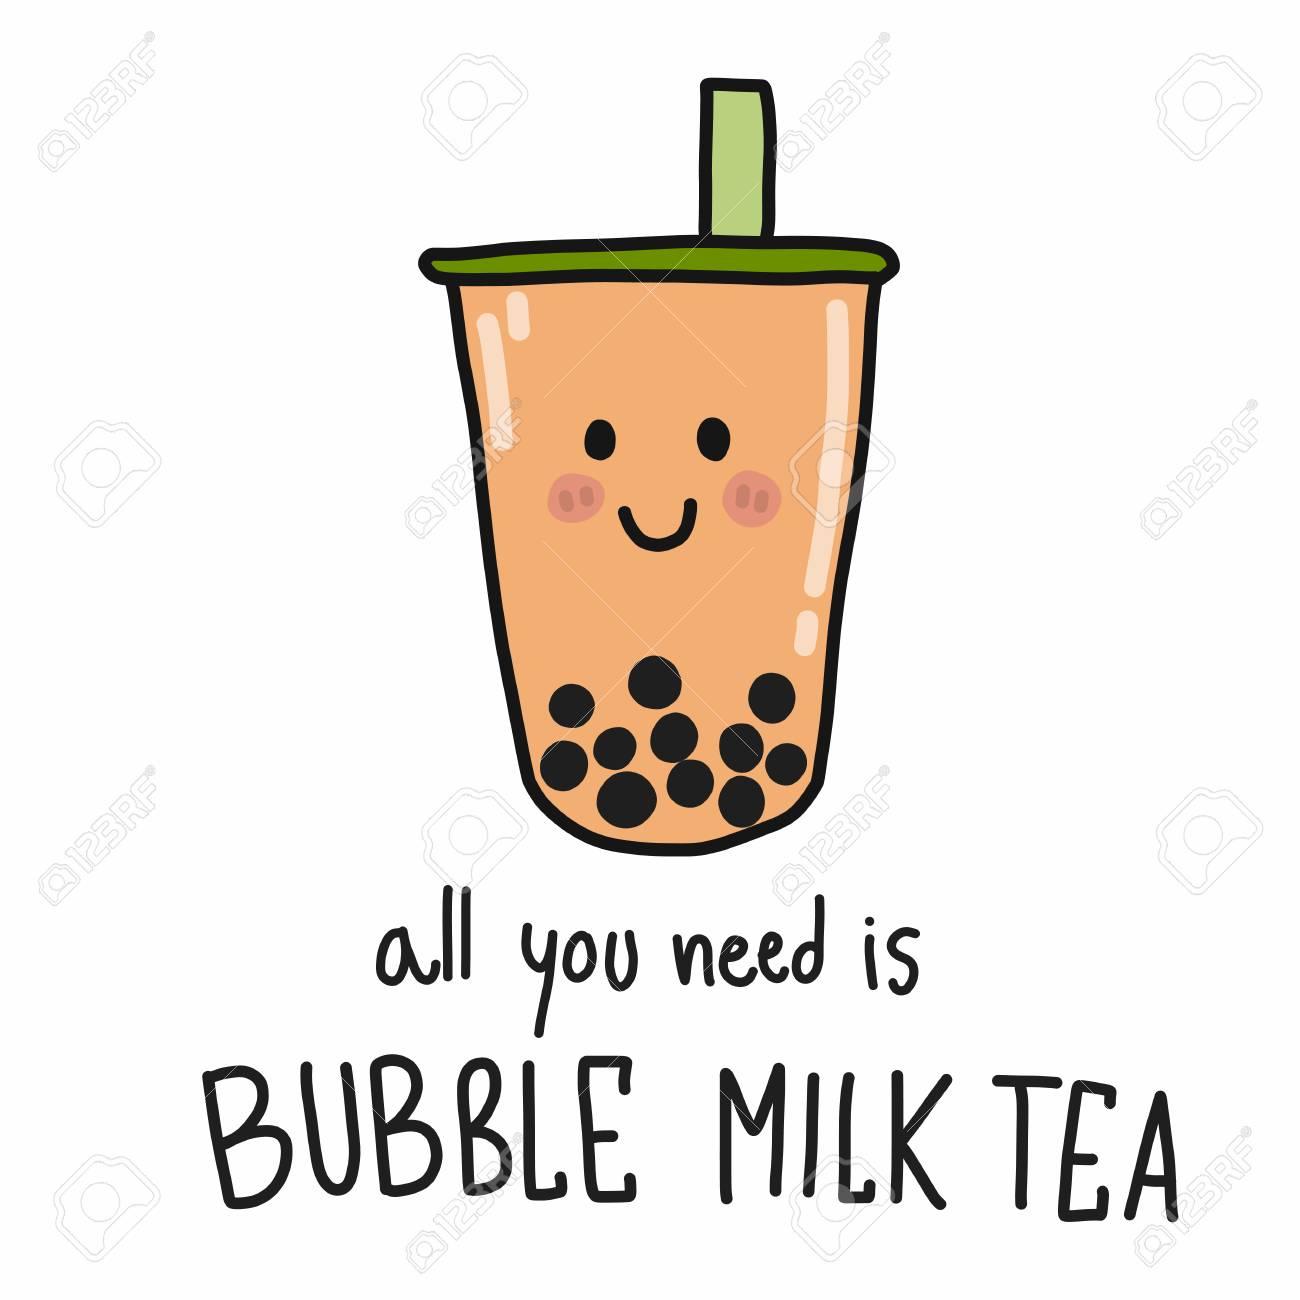 All you need is bubble milk tea cartoon vector illustration doodle style - 109588884